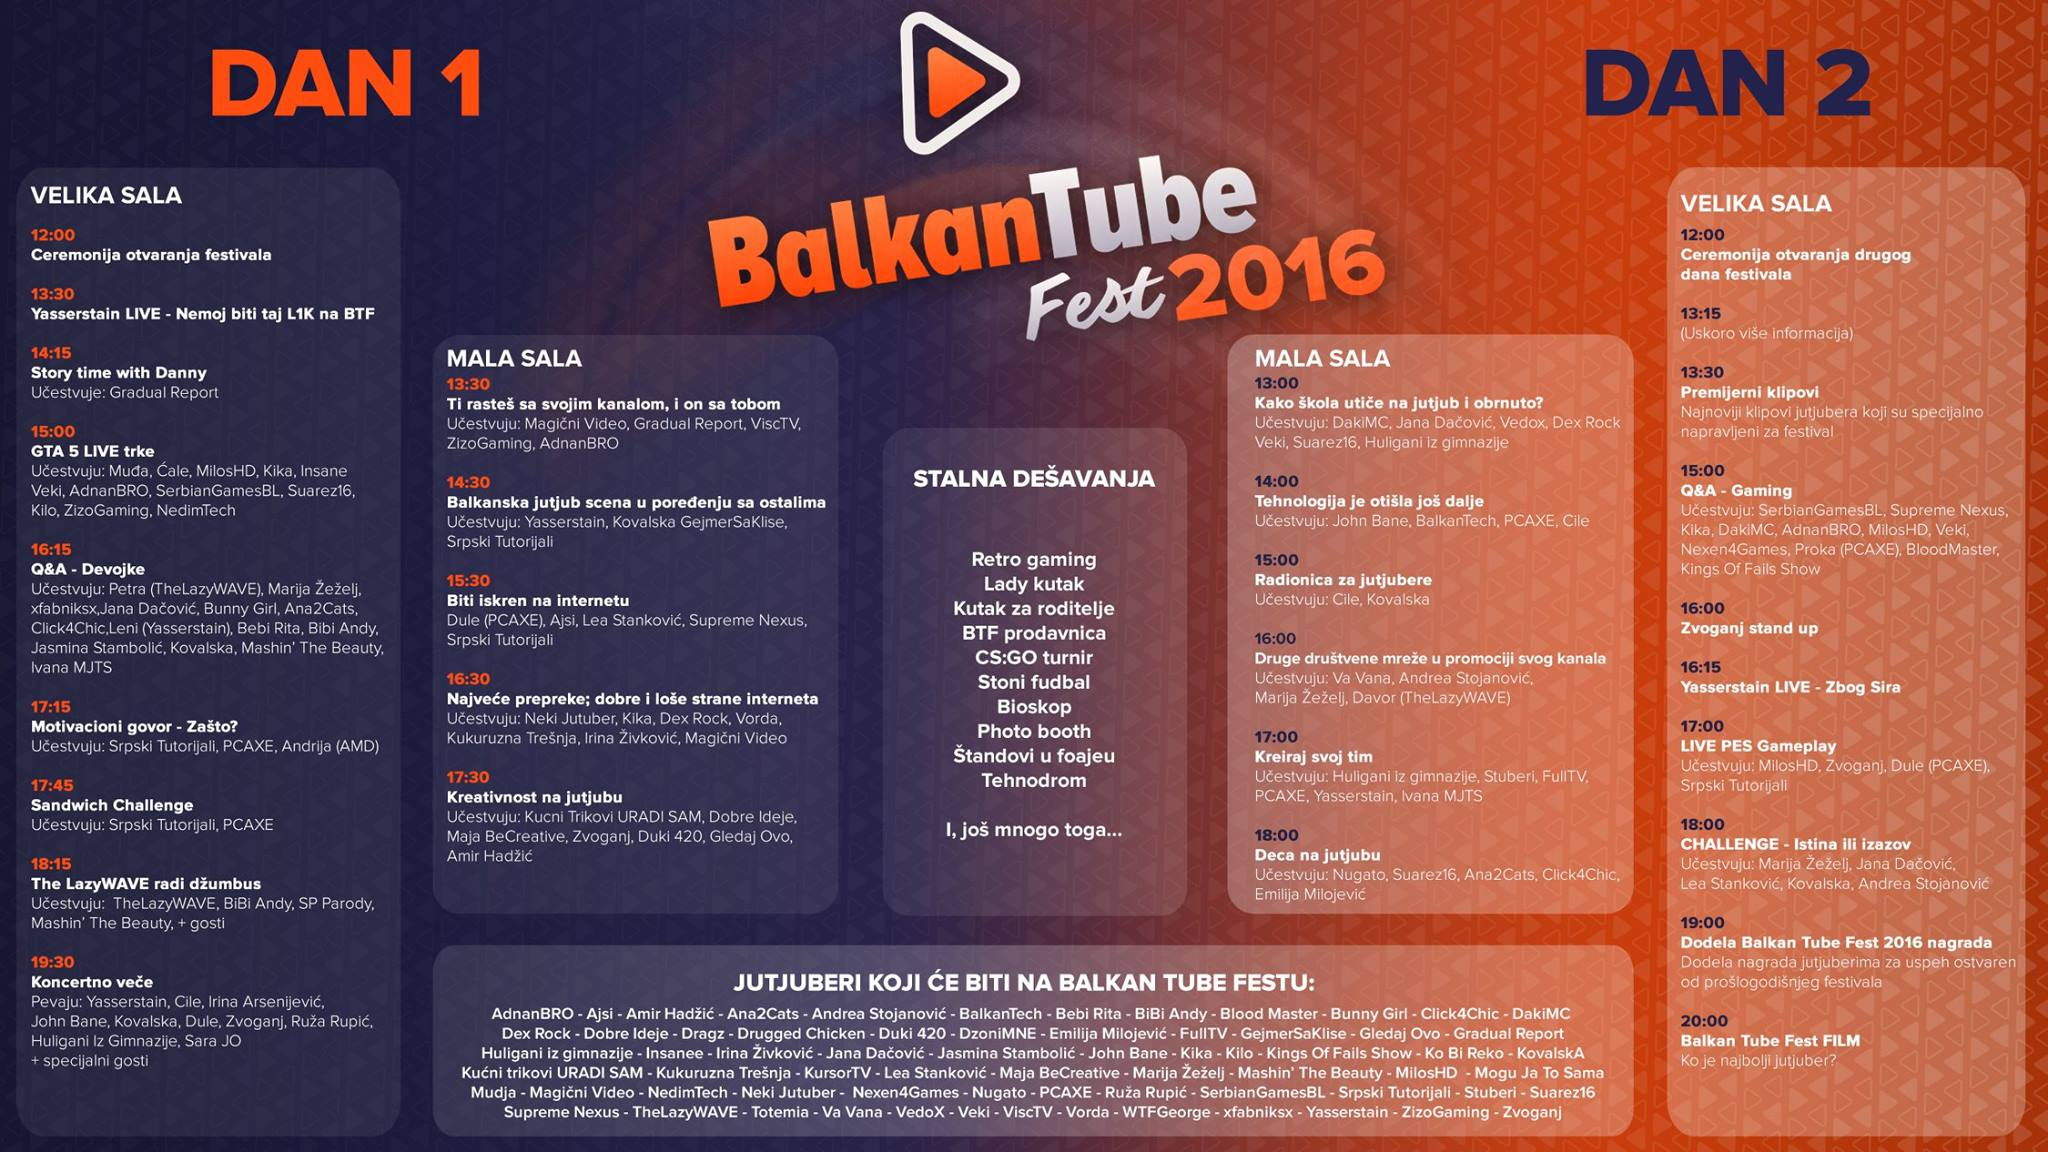 Photo: Facebook@BalkanTubeFest